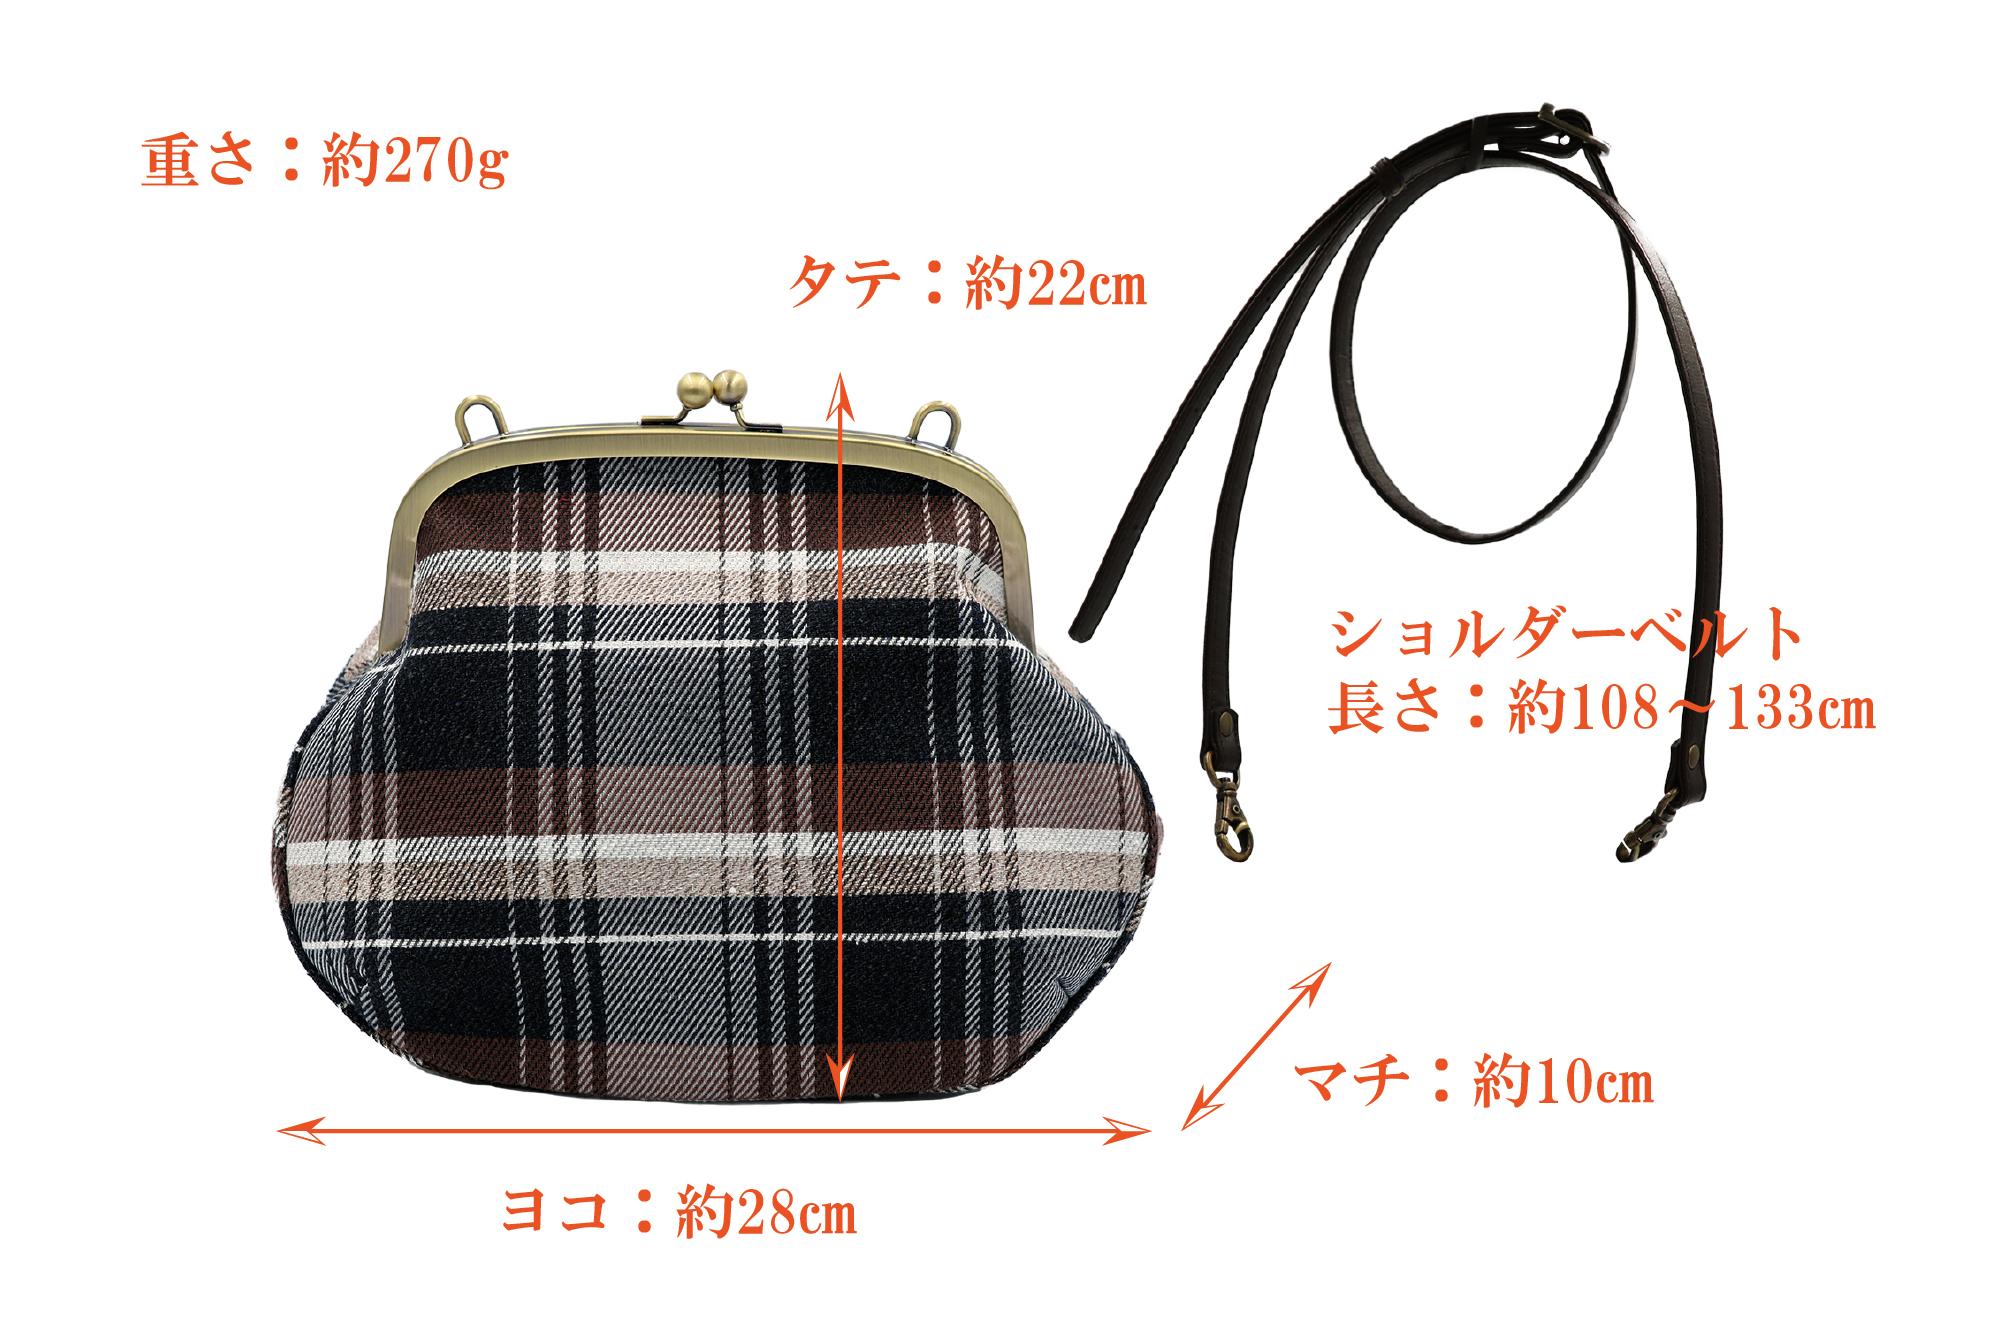 Atelier Kyoto Nishijin/西陣織シルクネップ・がまぐちポシェット・メランジチェック・チャコールブラック・日本製